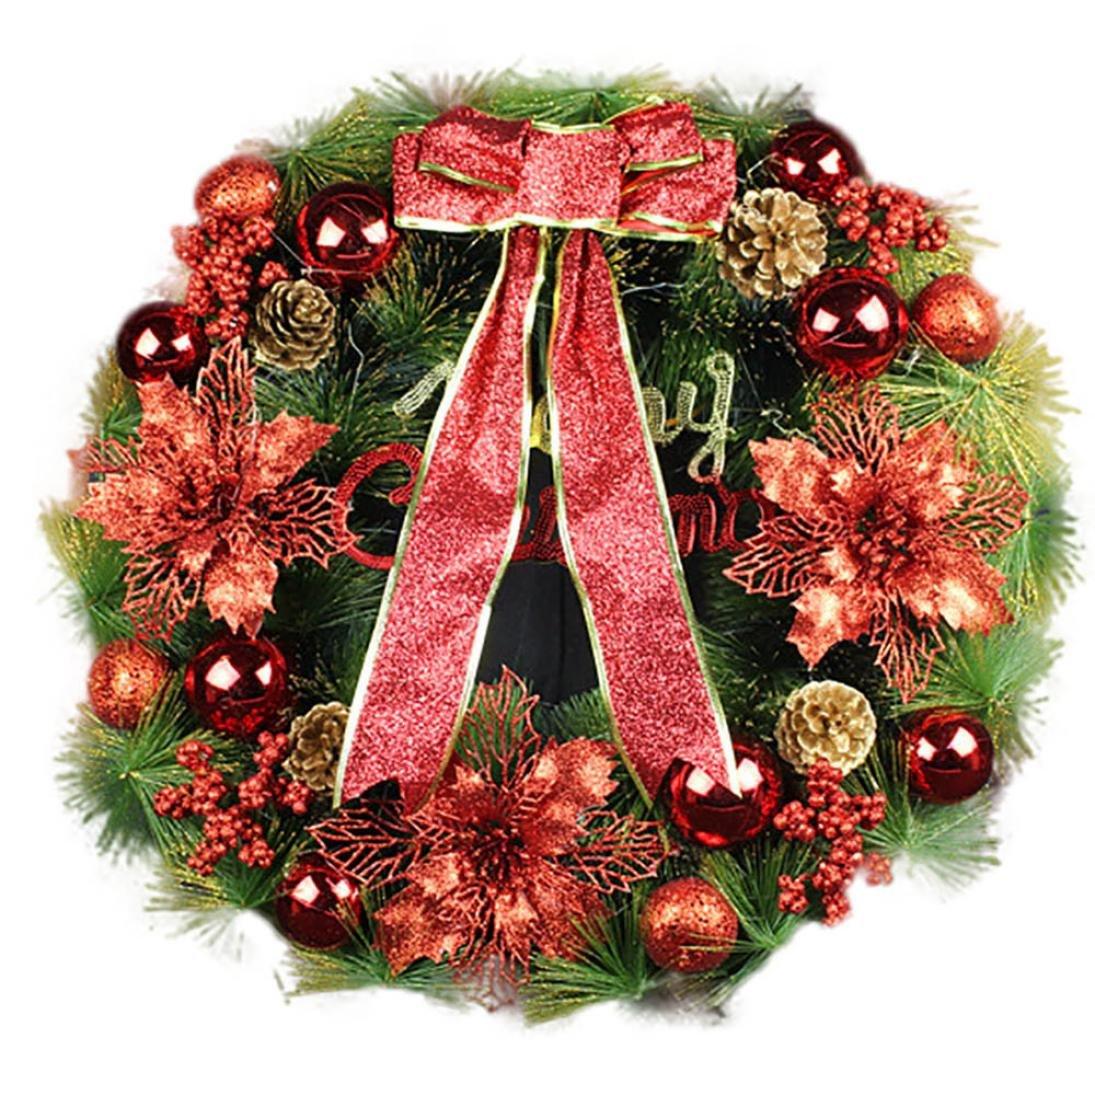 Kanzd Merry Christmas Large Wreath Red Bowknot Garland Door Wreath Door Wall Ornament Decor (A)